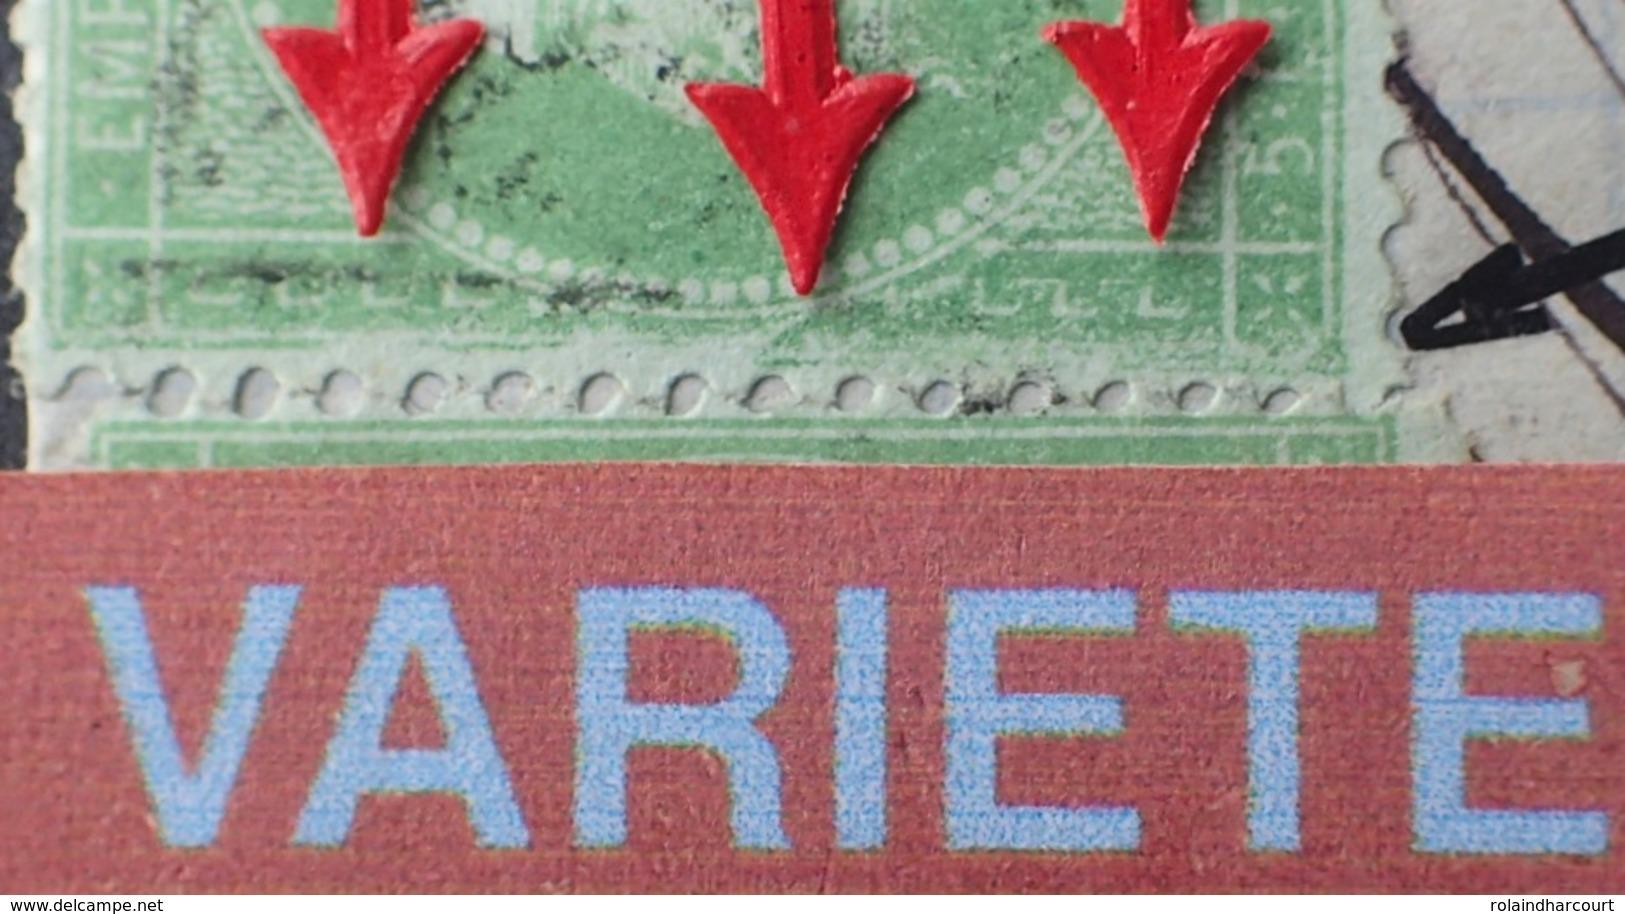 R1917/163 - NAPOLEON III N°35 + CERES N°60A Sur ✉️ ROUBAIX à PARIS - SUPERBE VARIETE ➤➤➤ GRANDE CASSURE DU CADRE GAUCHE - 1862 Napoleon III